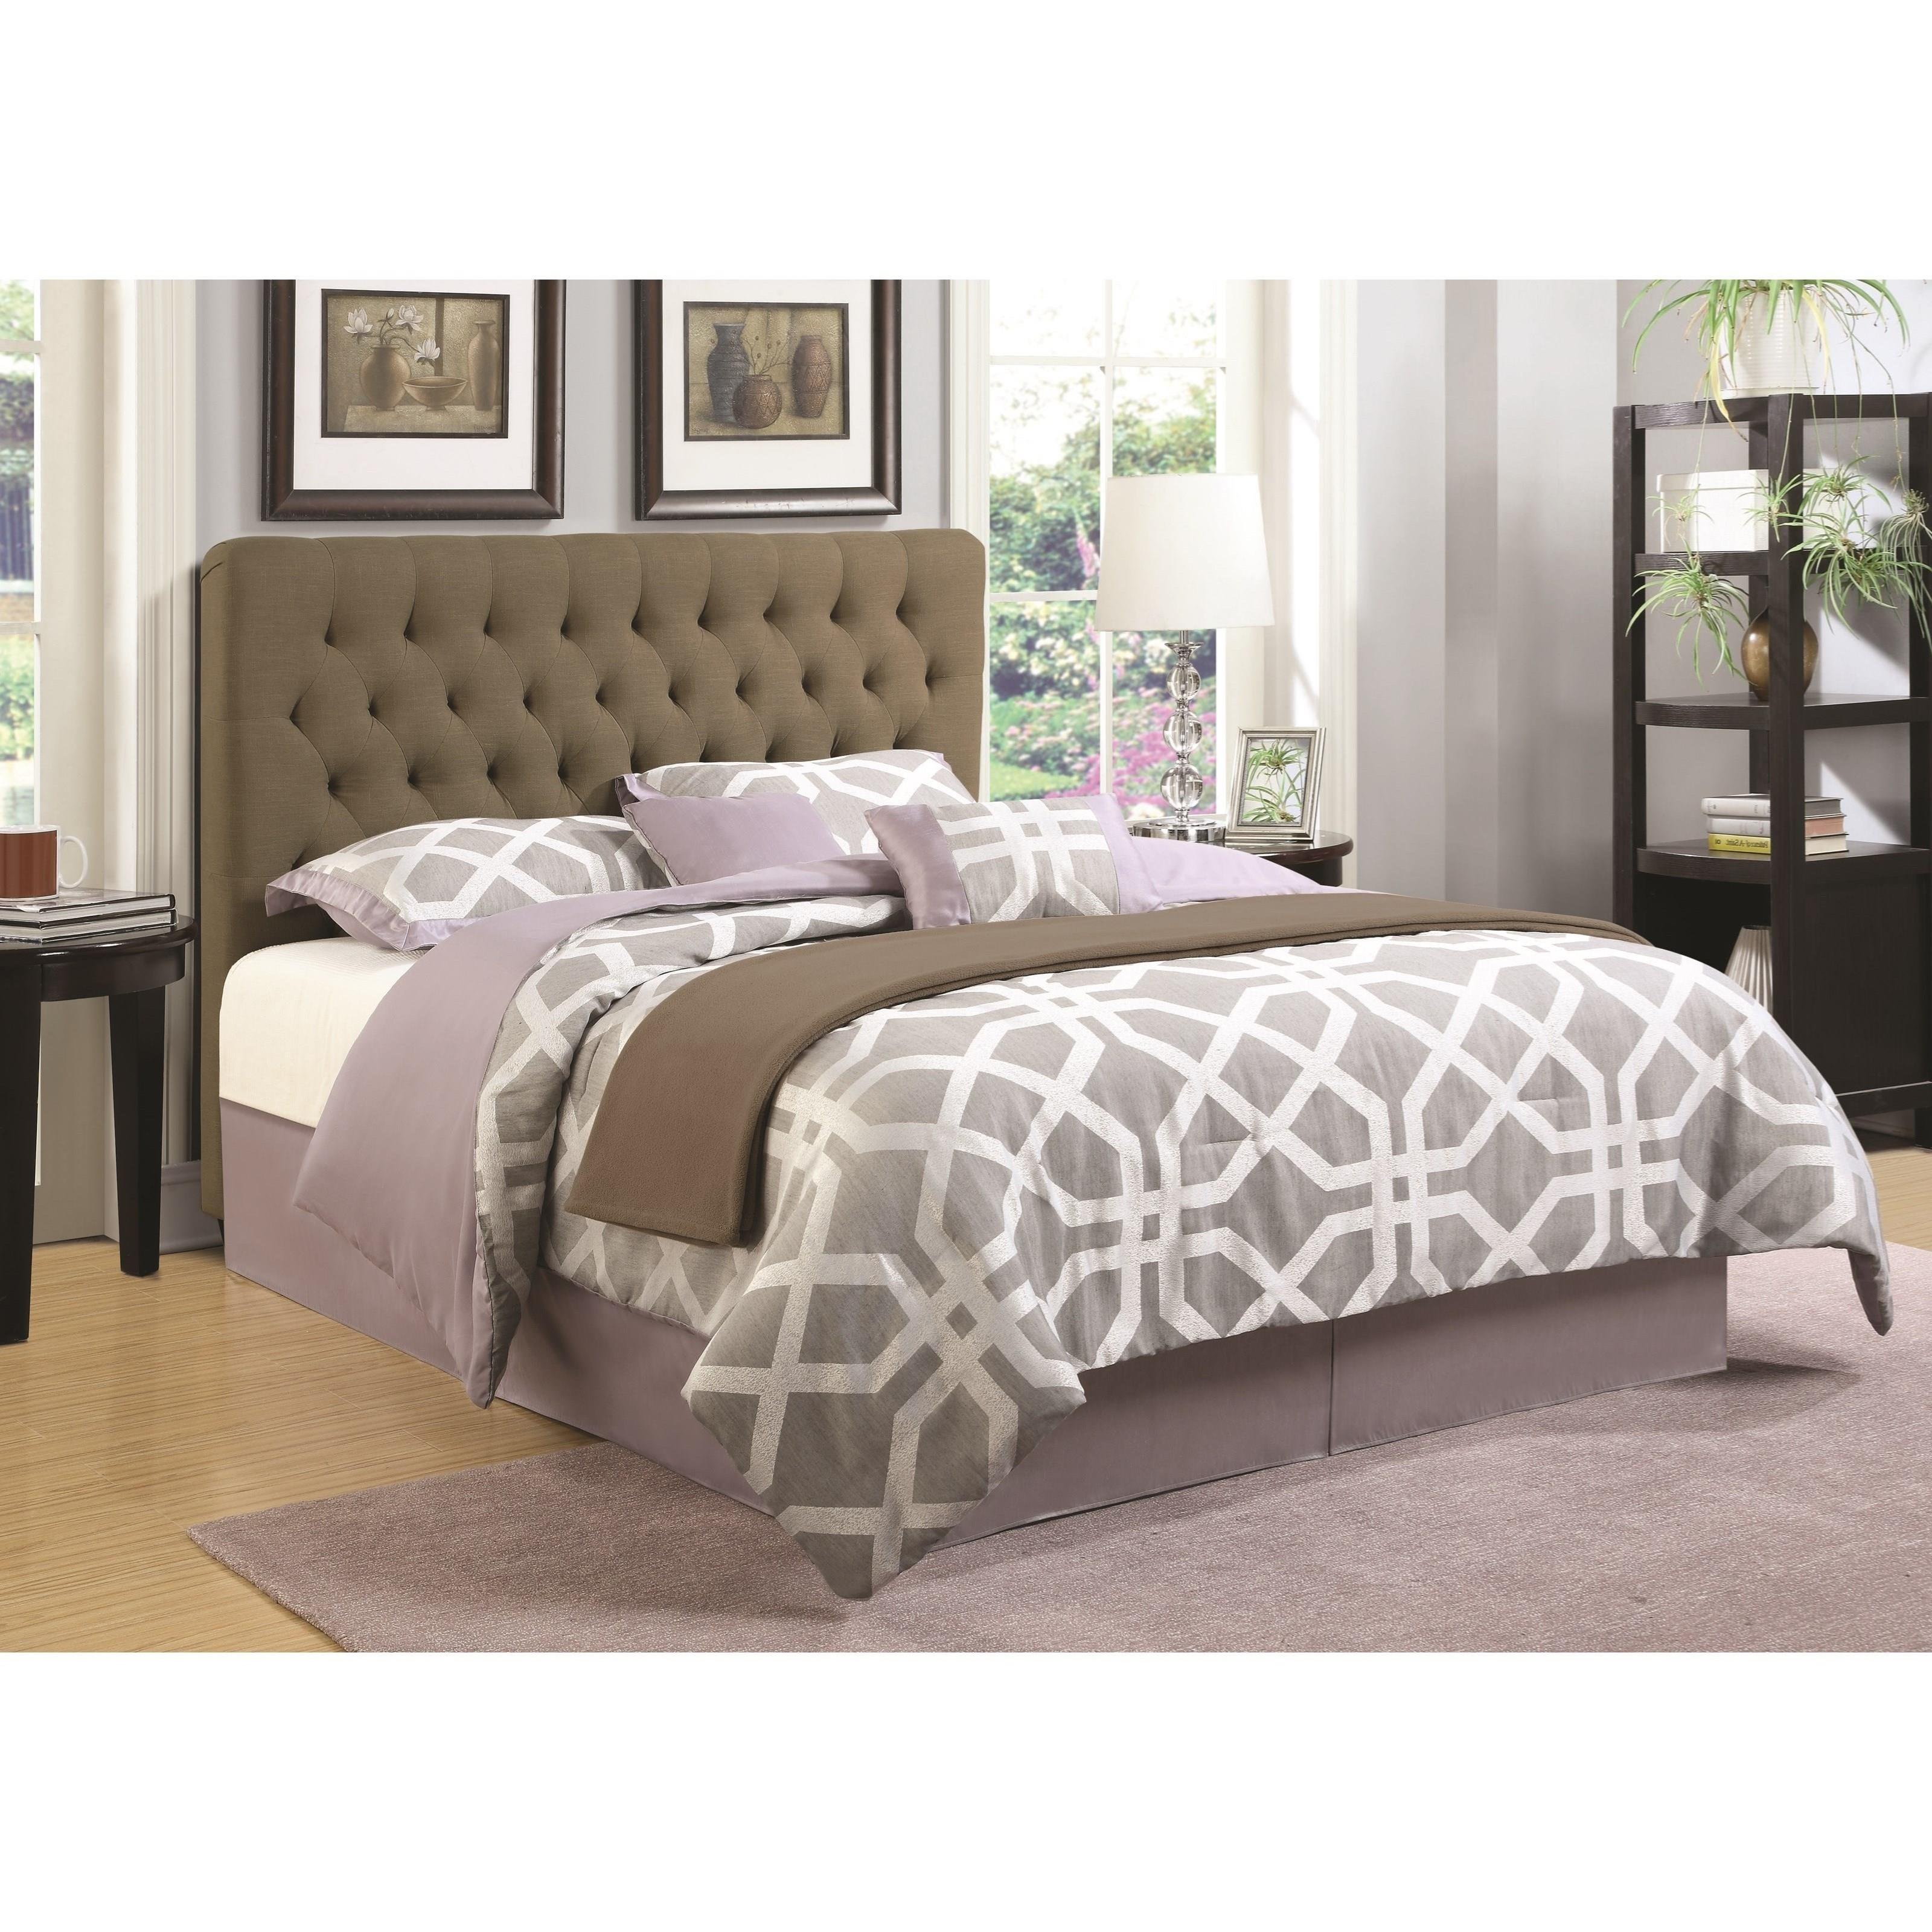 Coaster Upholstered Beds California King Headboard - Item Number: 300528KWB1